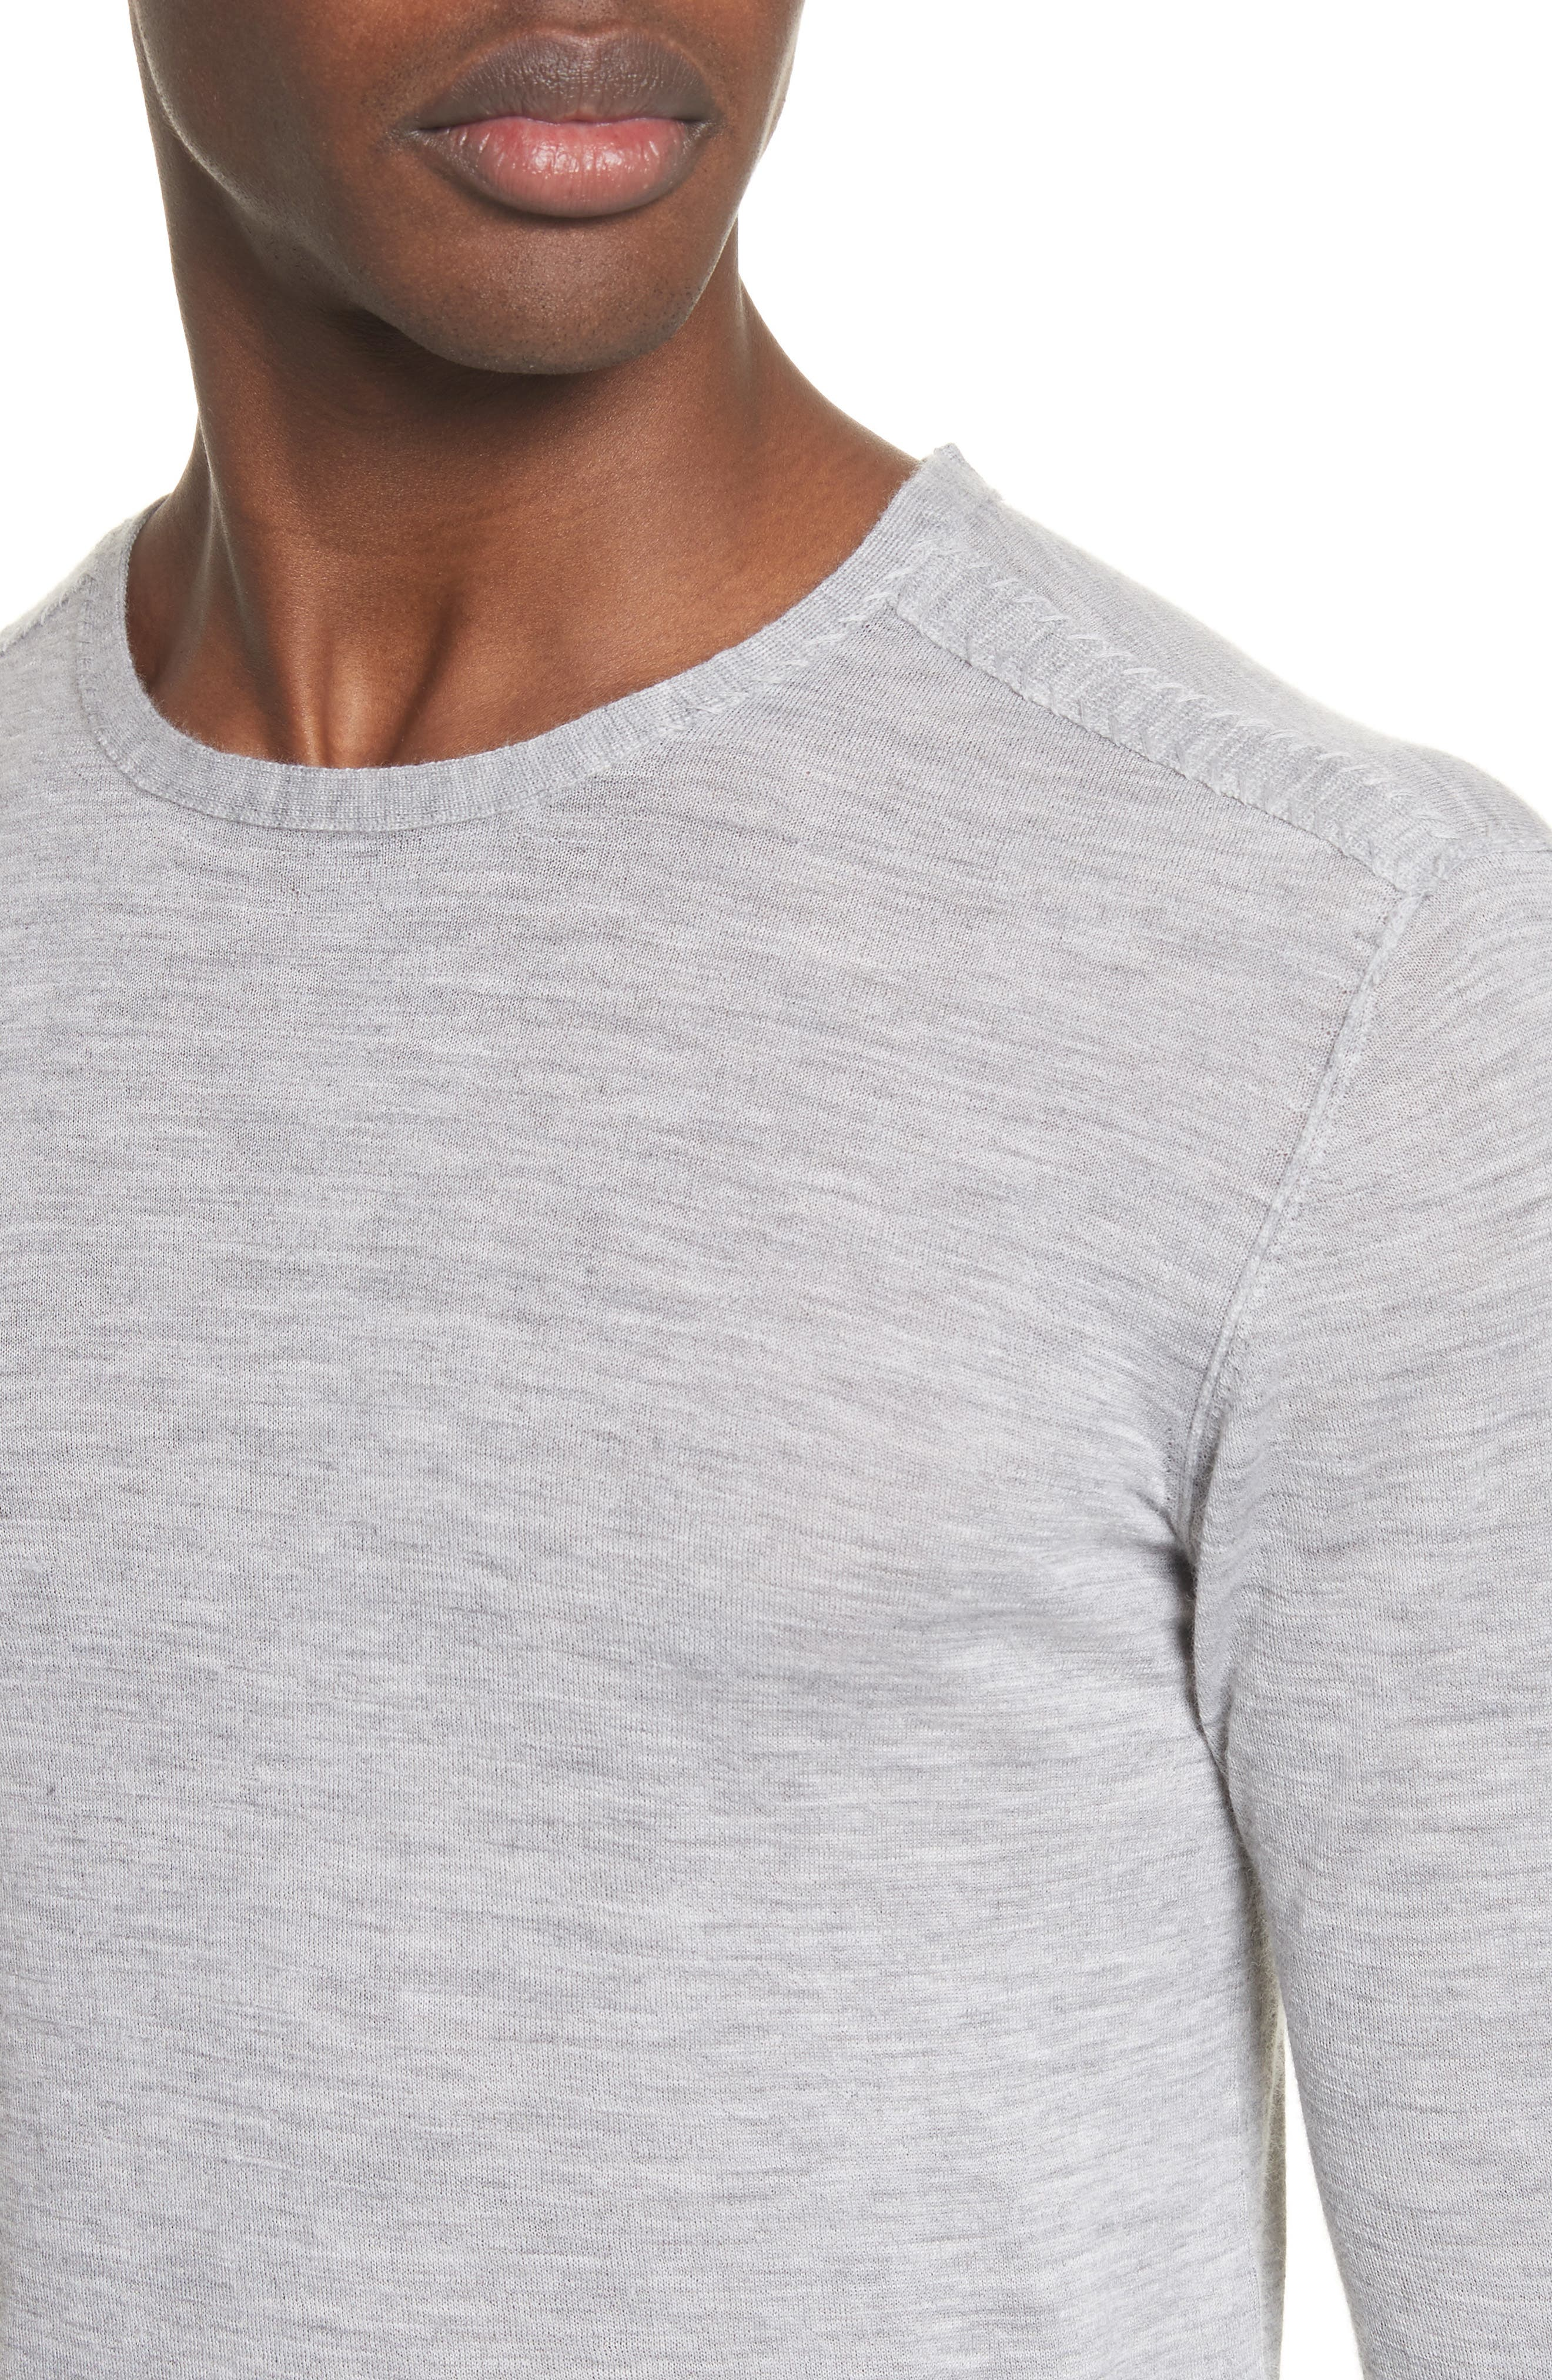 Cashmere Crewneck Sweater,                             Alternate thumbnail 4, color,                             055